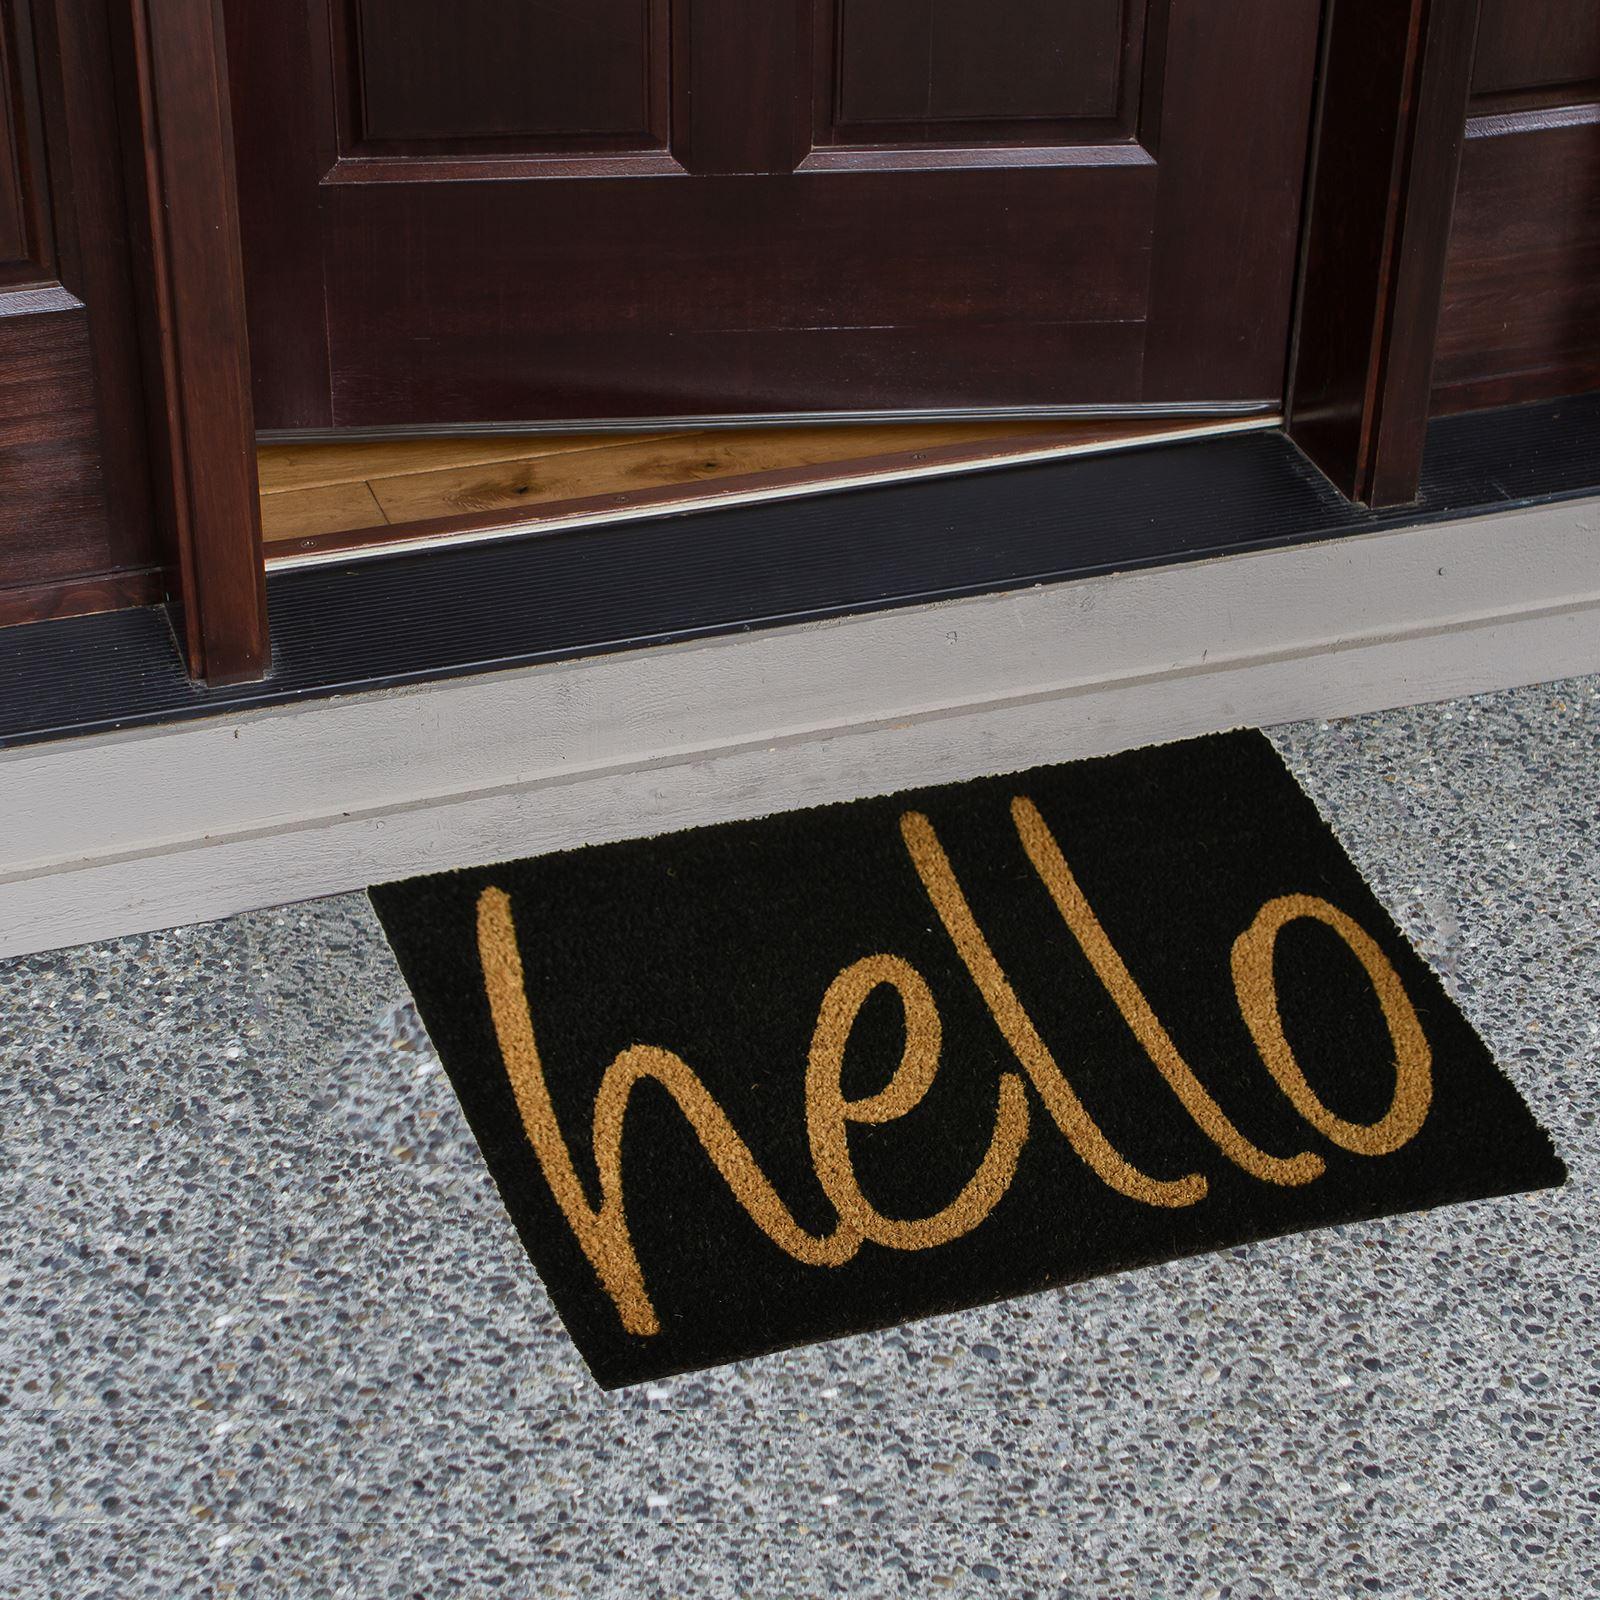 Plain-Non-Slip-Door-Mat-Tough-Natural-Coir-PVC-Back-Welcome-Doormat-40-x-60cm miniatura 54